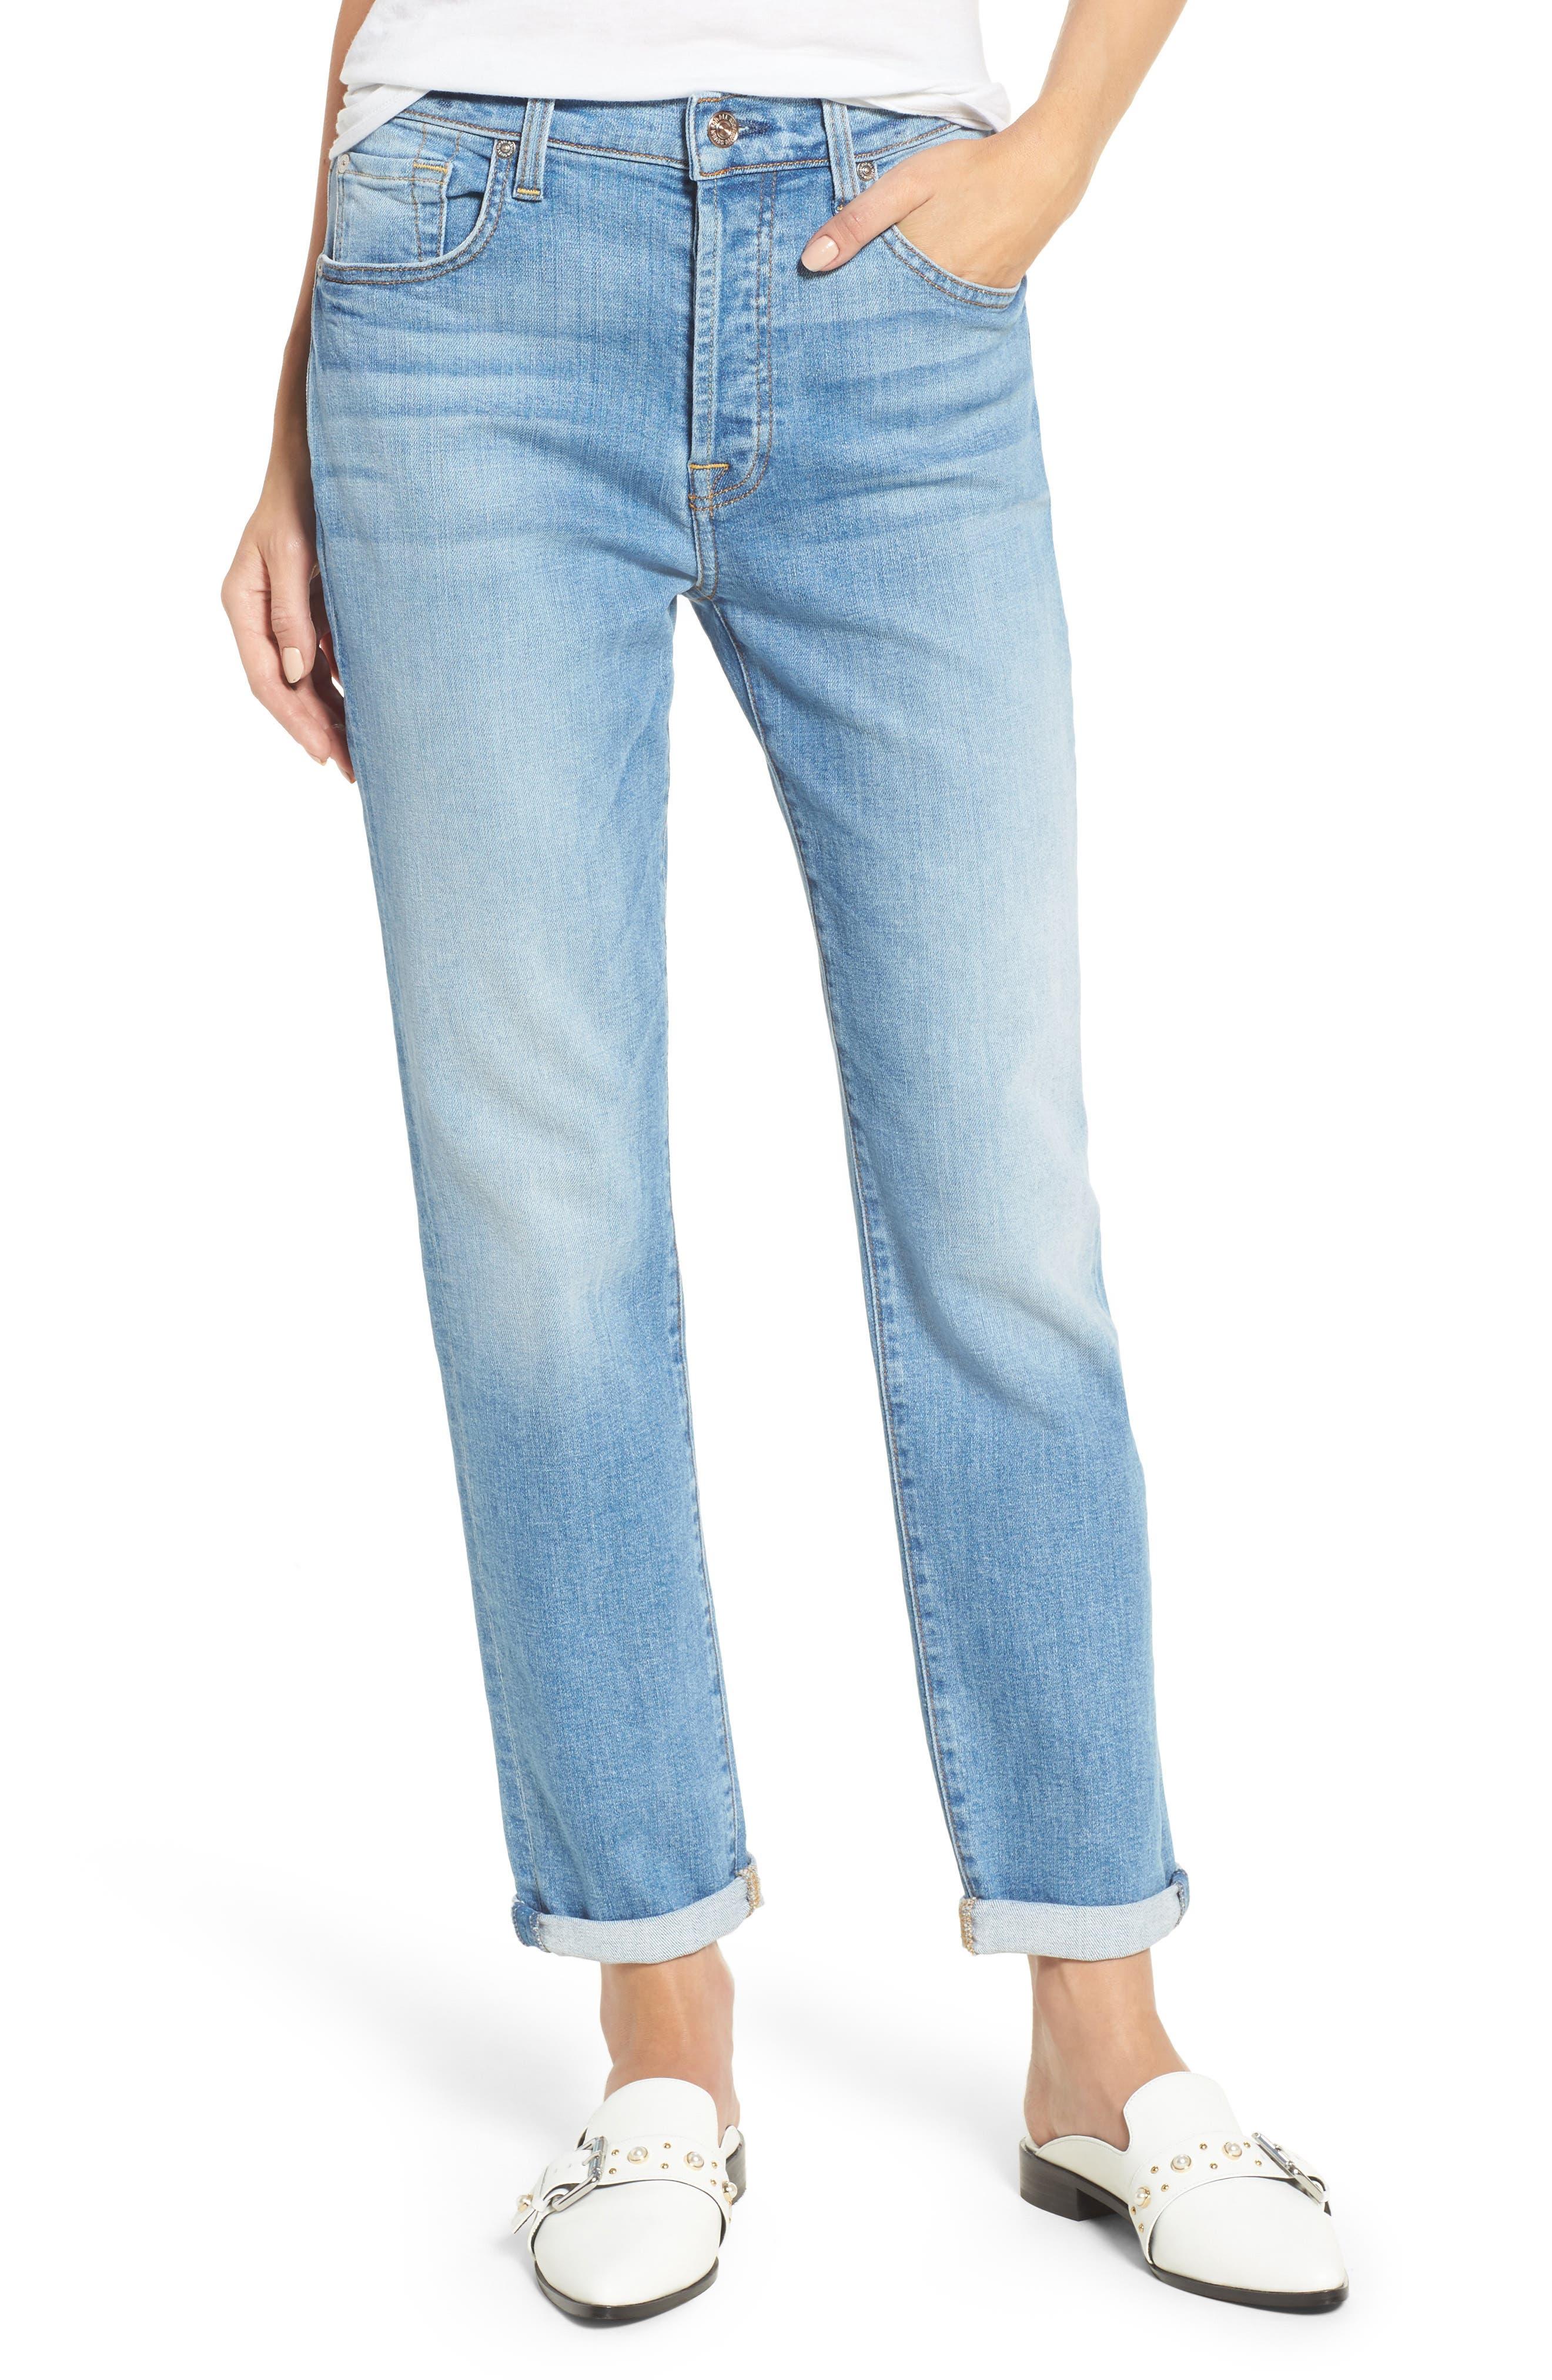 Josefina High Waist Crop Boyfriend Jeans,                             Main thumbnail 1, color,                             East Village